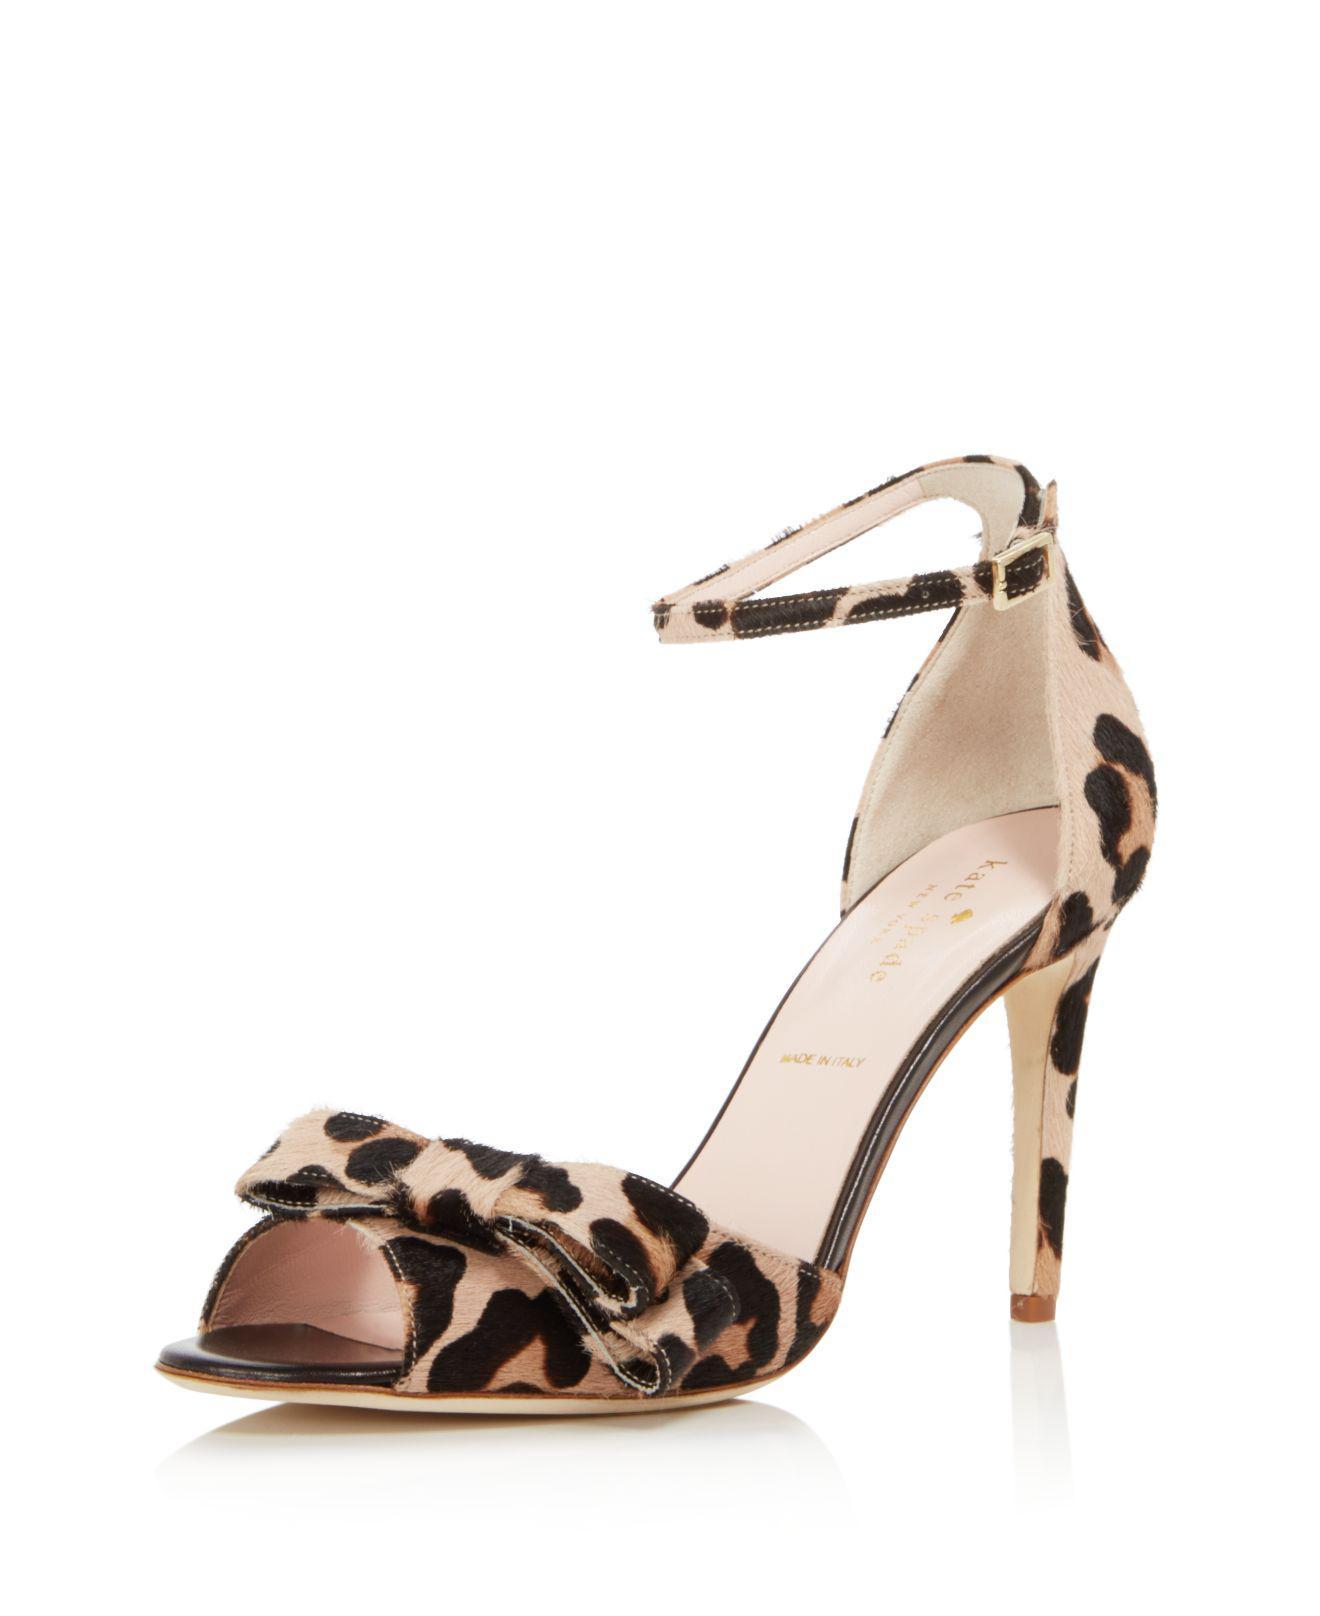 Free Shipping 100% Authentic Kate Spade New York Women's Ismay Print Calf Hair High-Heel Bow Sandals Visa Payment Sale Online bZisQaRA